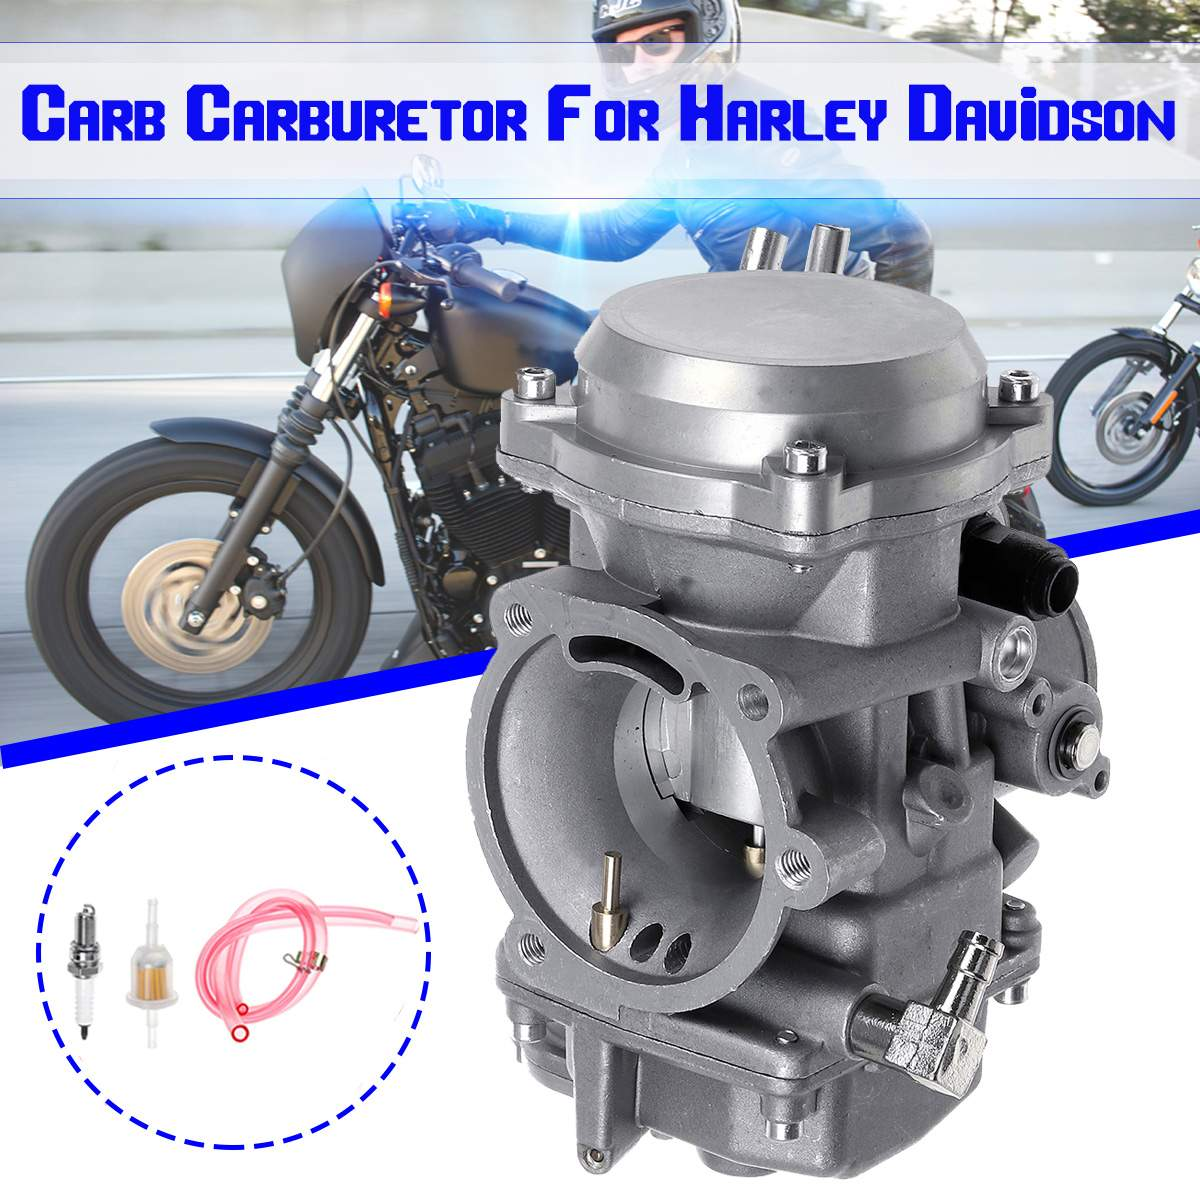 40mm Motorcycle Carb Carburetor 27421-99C 27490-04 27465-04 27031-95 For Harley Davidson/Softail/Dyna FXR Touring/Sportster